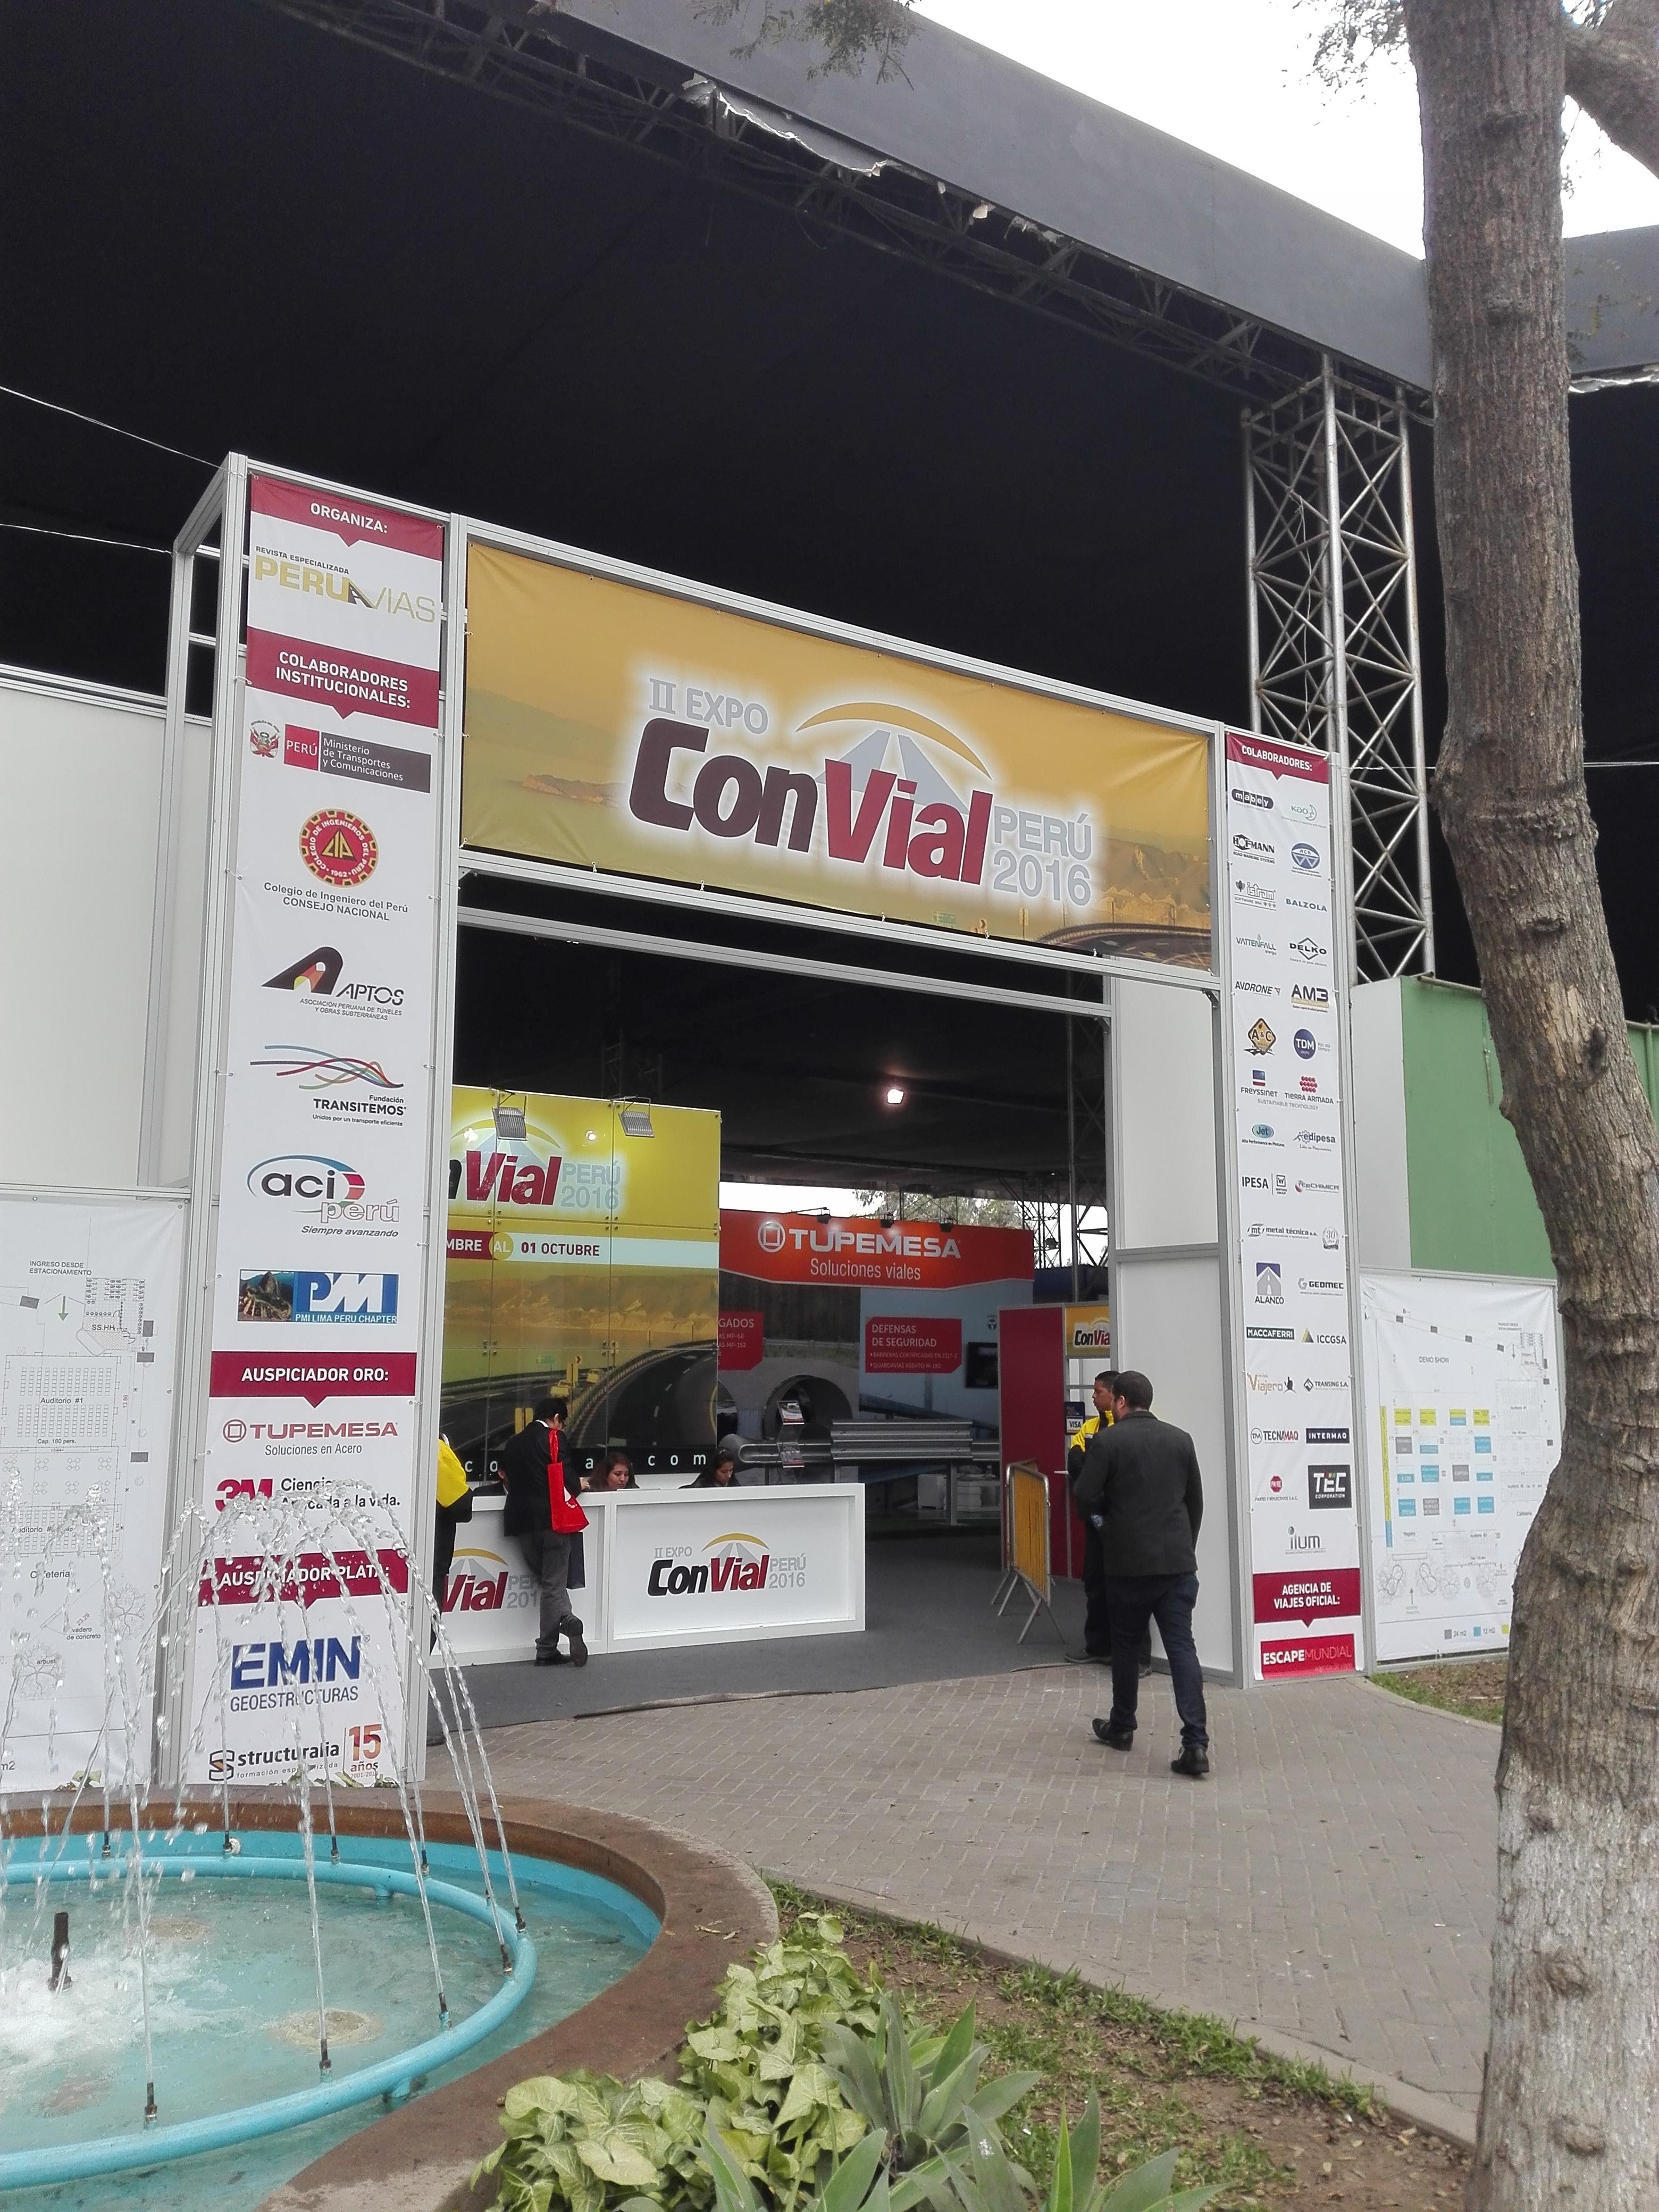 APTOS - CONVIAL 2016 (30)